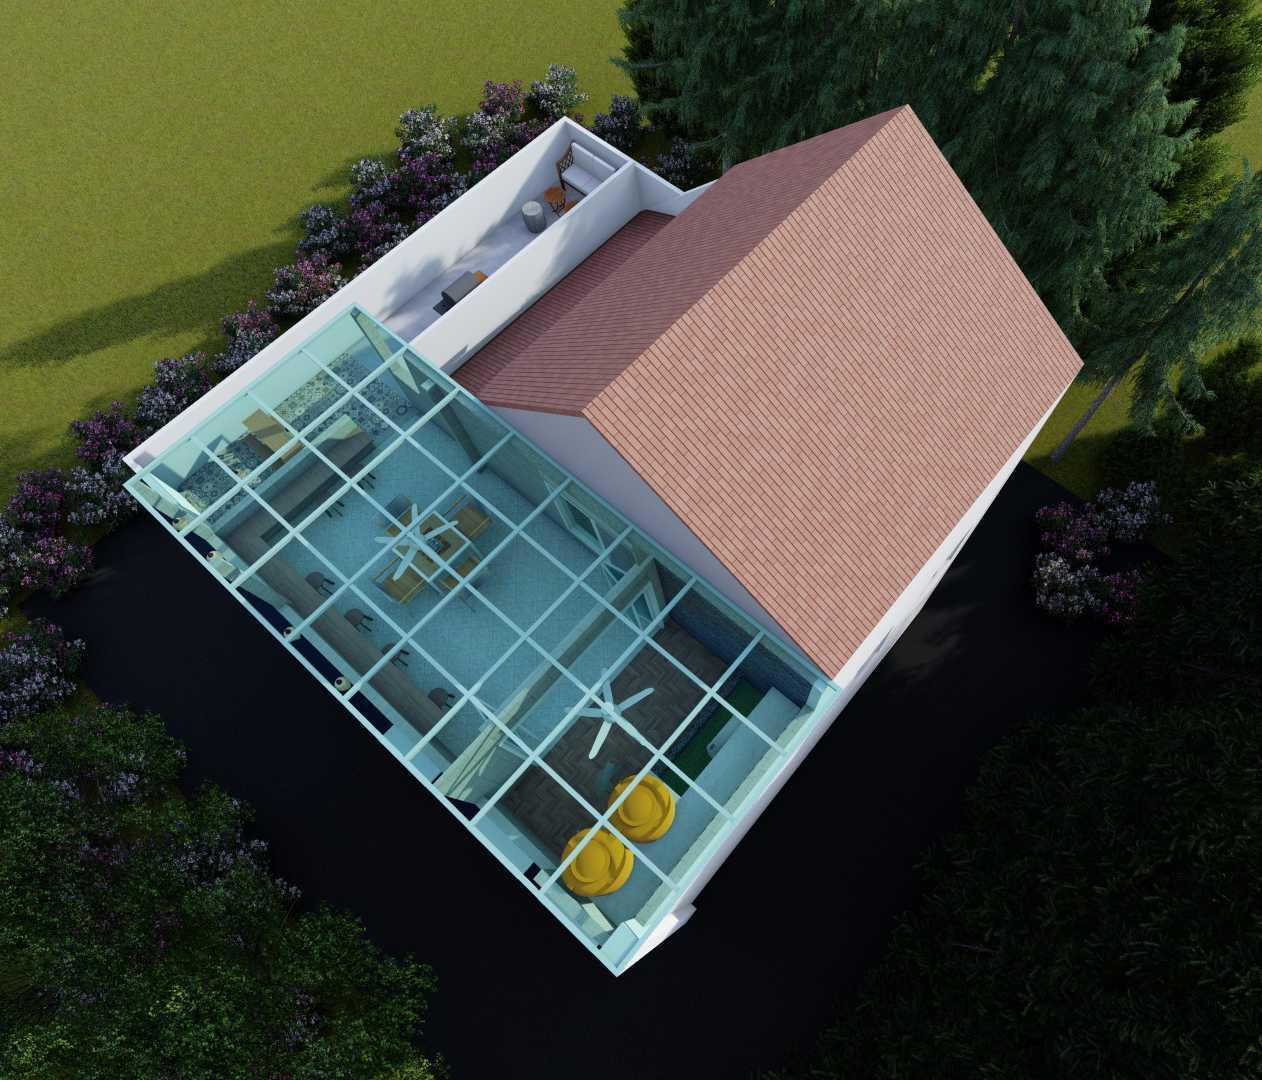 Rinto Katili Rumah Tinggal Iy, Bogor Bogor, Jawa Barat, Indonesia Bogor, Jawa Barat, Indonesia Rinto-Katili-Rumah-Tinggal-Ibu-Yetty-Bogor   62673